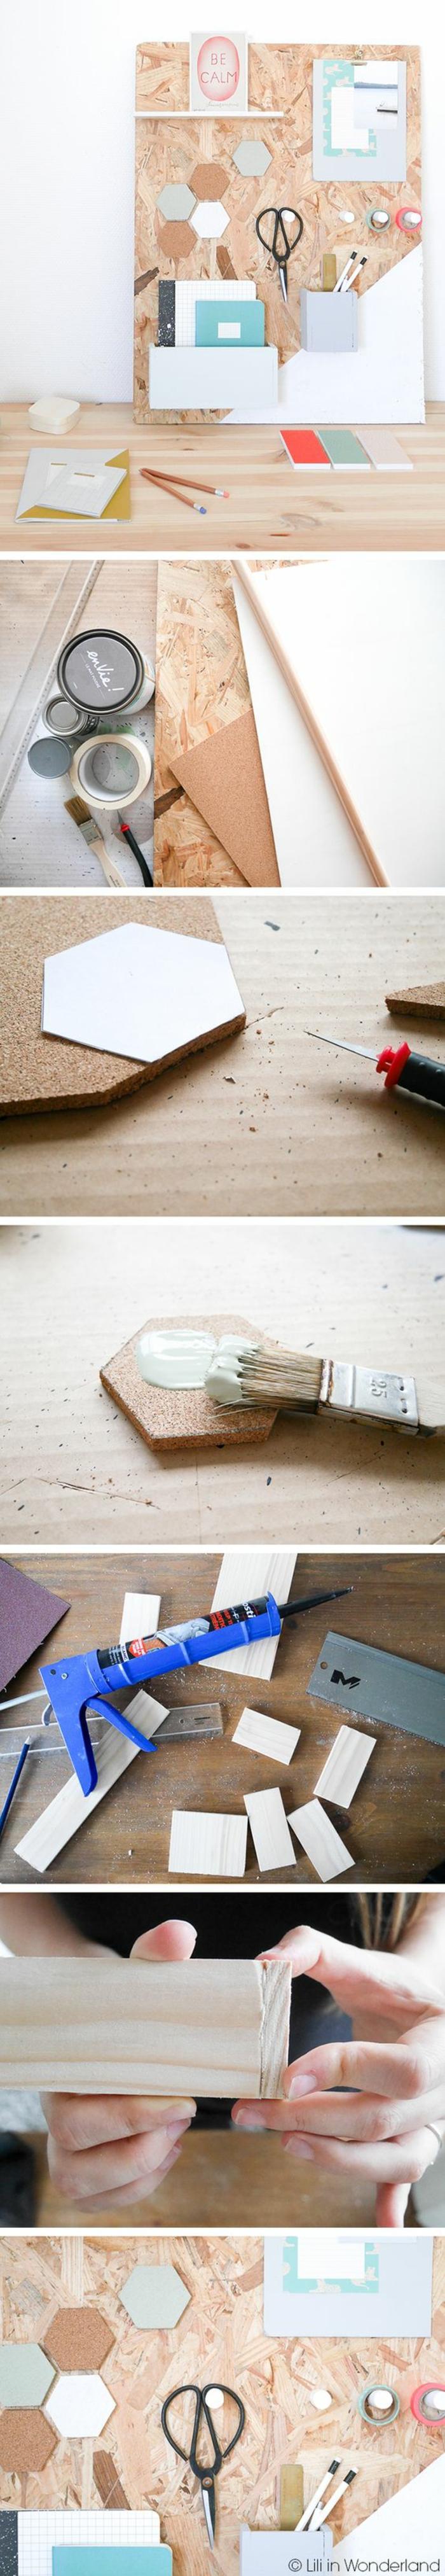 diy pinnwand aus holz, hefte, stifthalter, farbpinsel